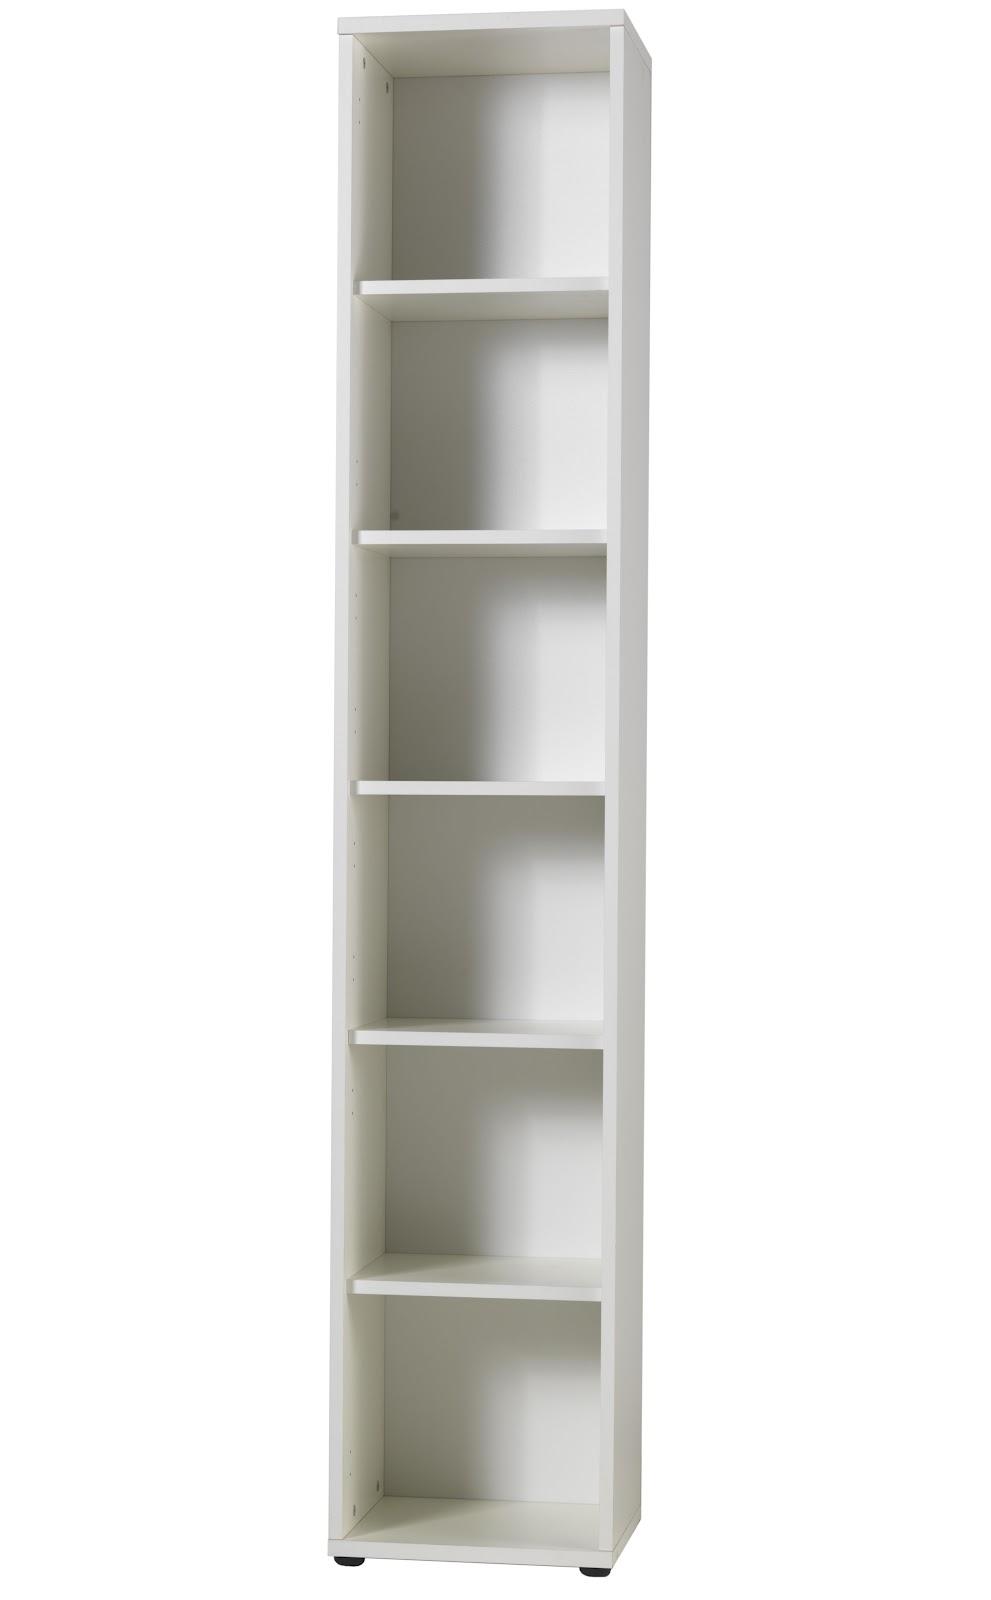 Laser Toner Cartridge Recycle Mura Book Shelf Storage